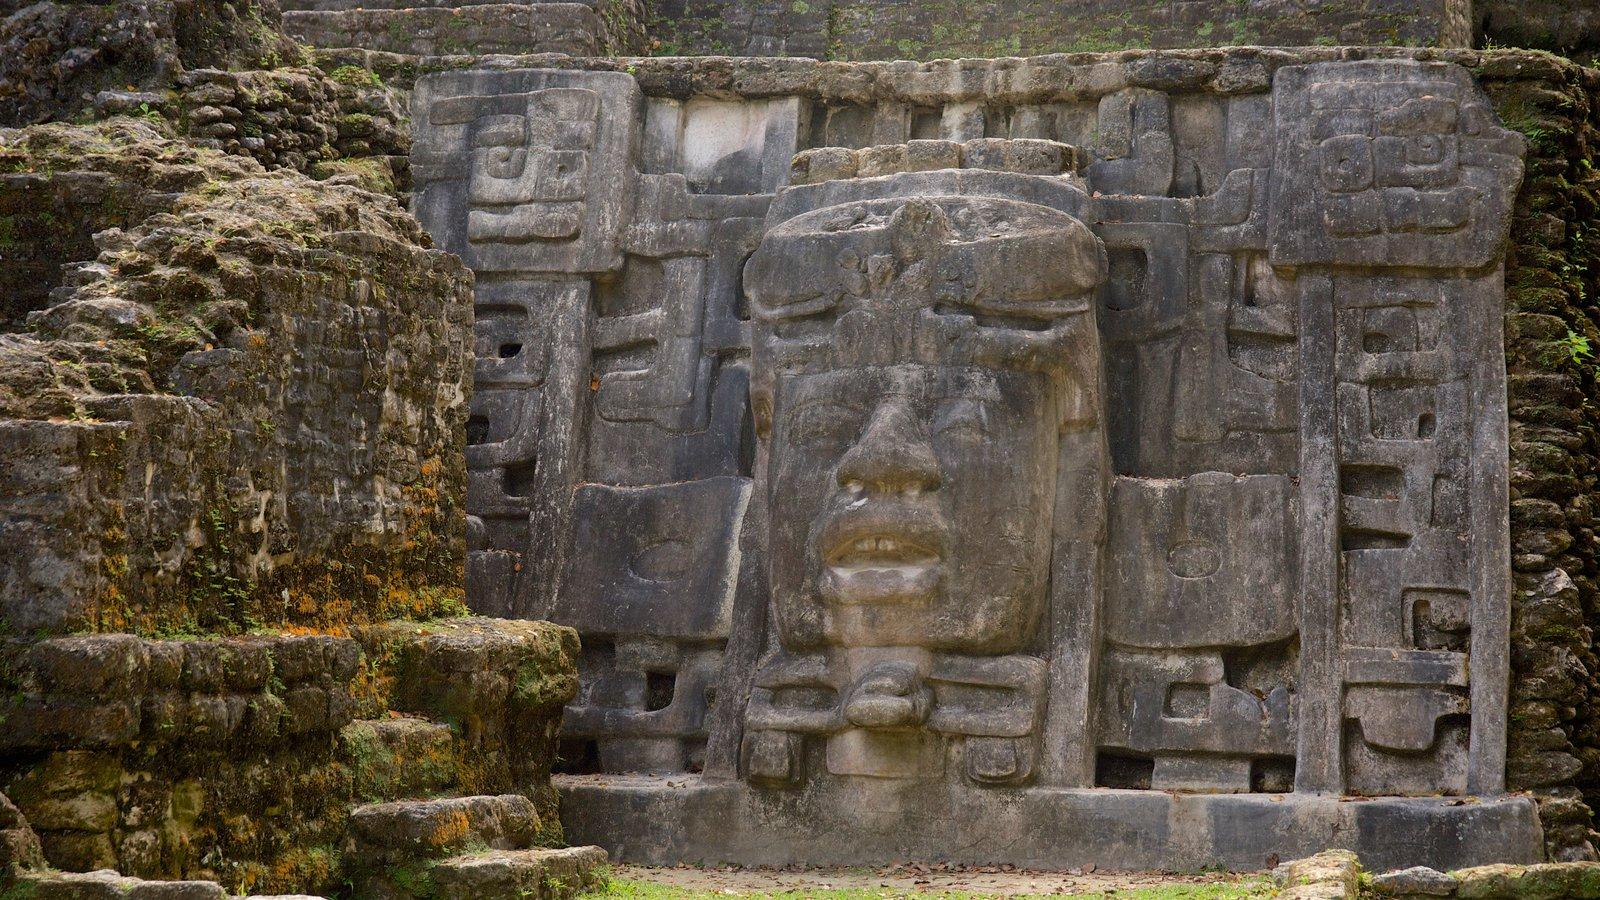 Lamanai caracterizando elementos de patrimônio e uma estátua ou escultura